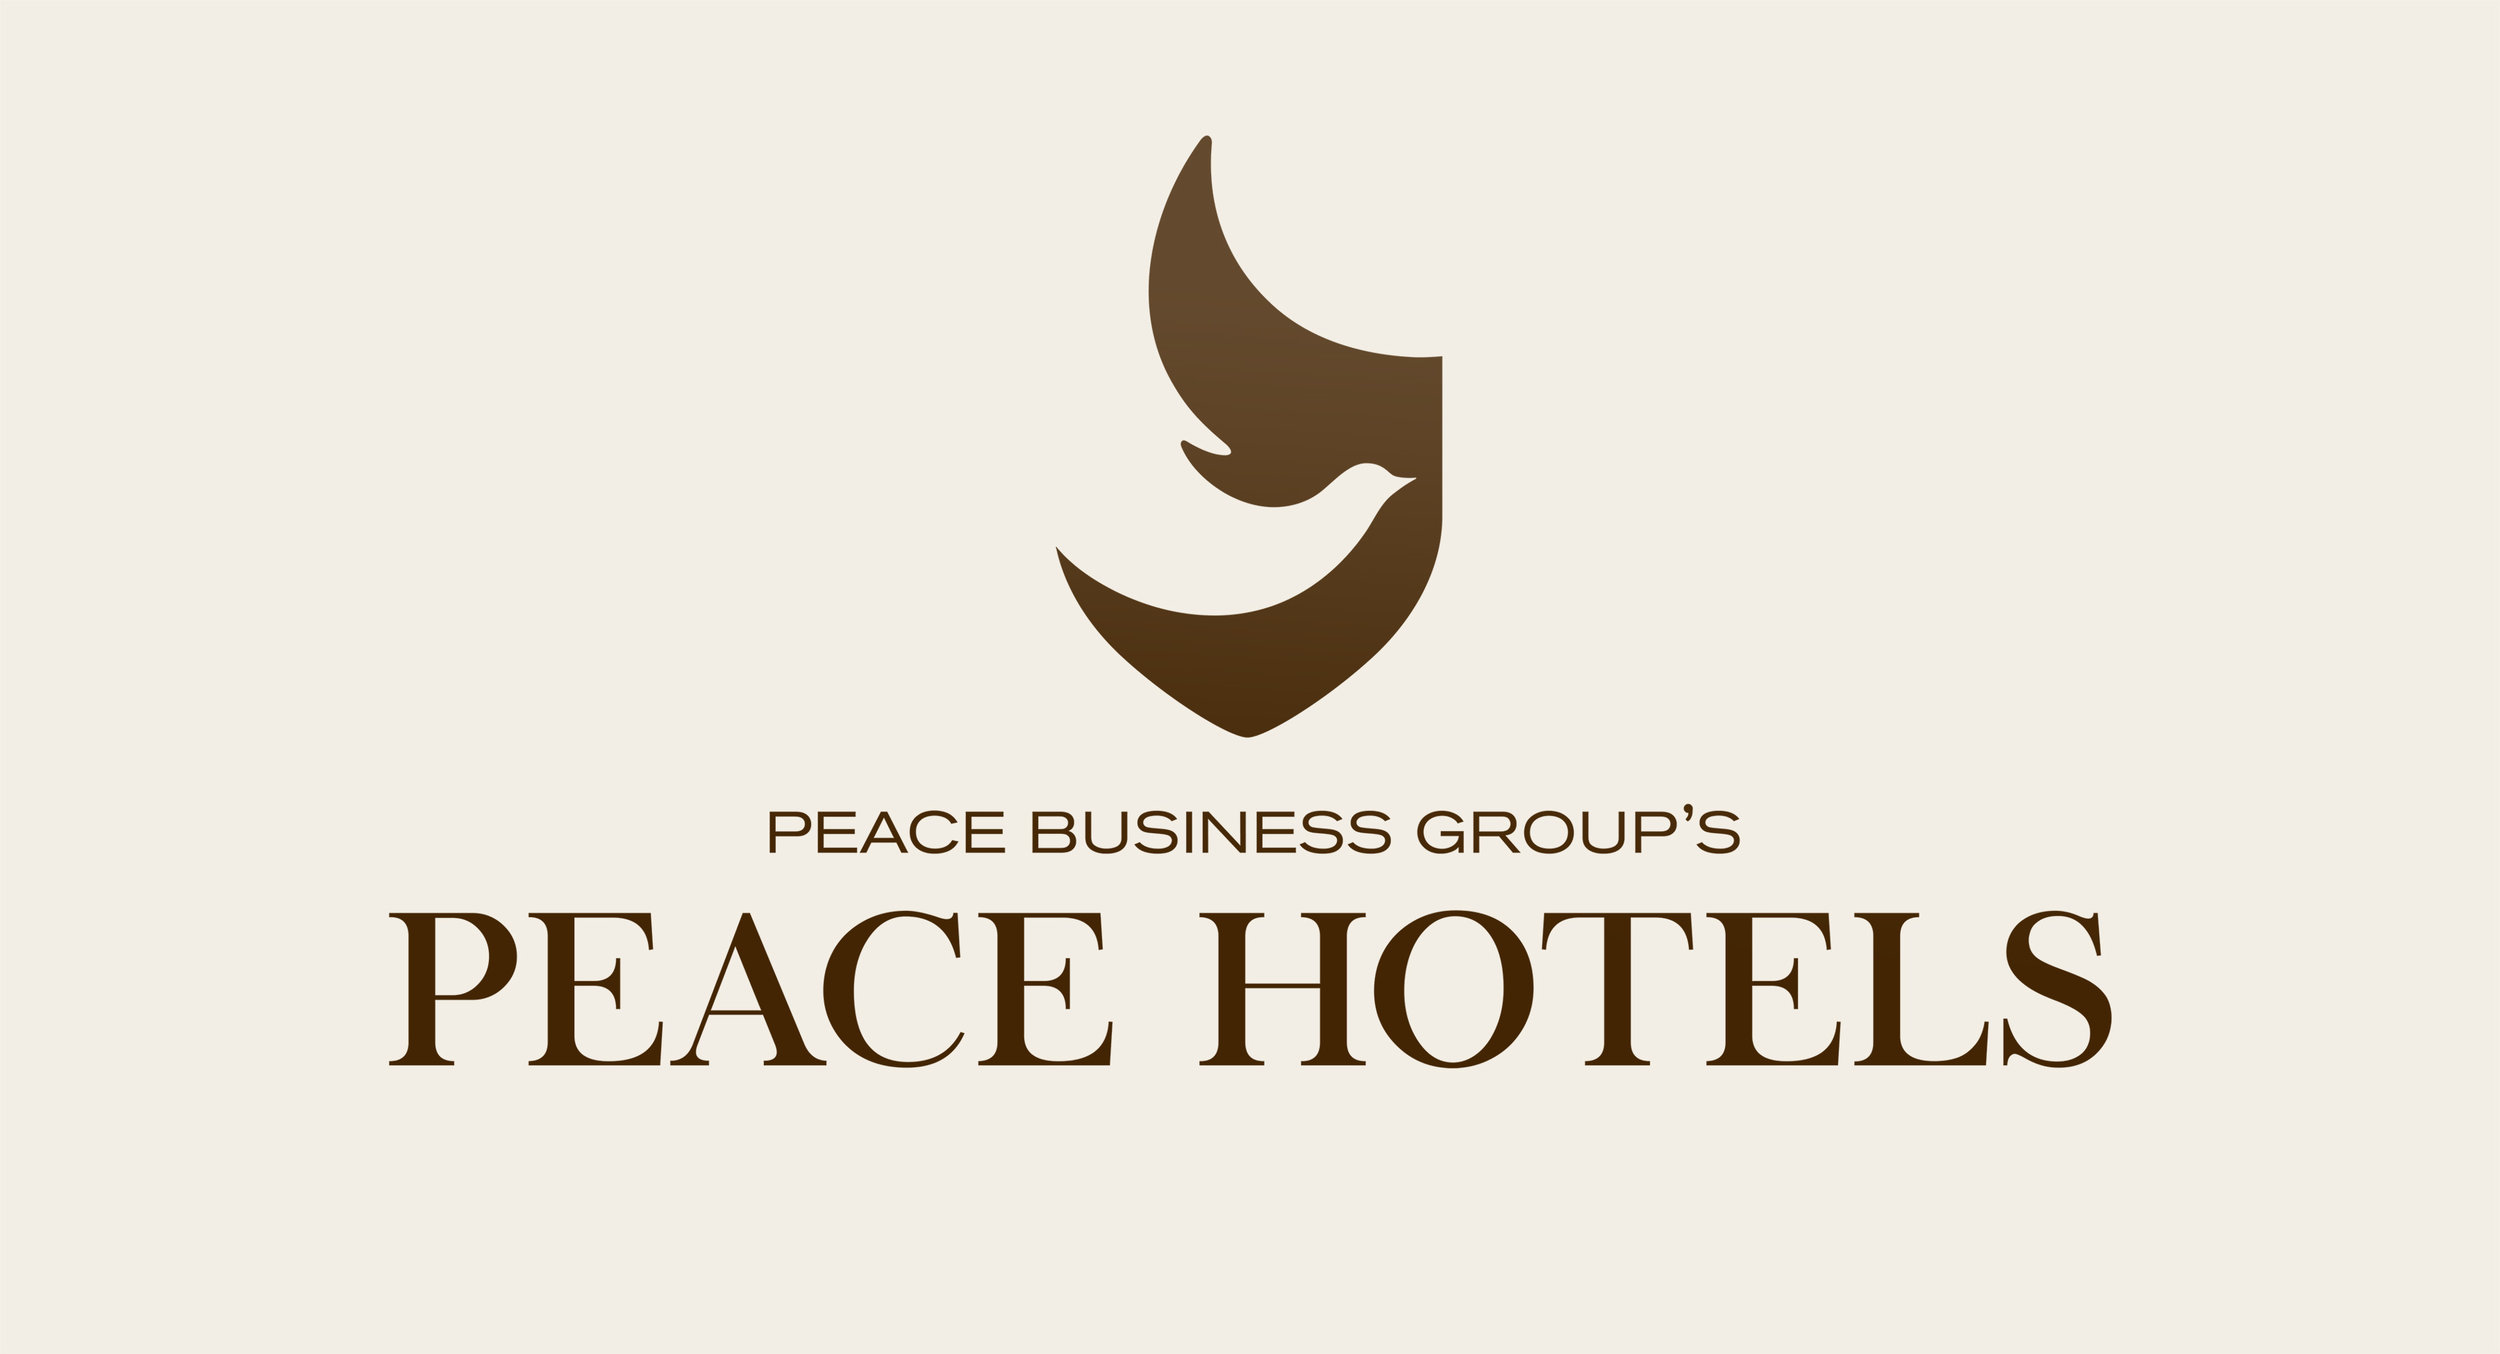 Hotel_logo.jpg